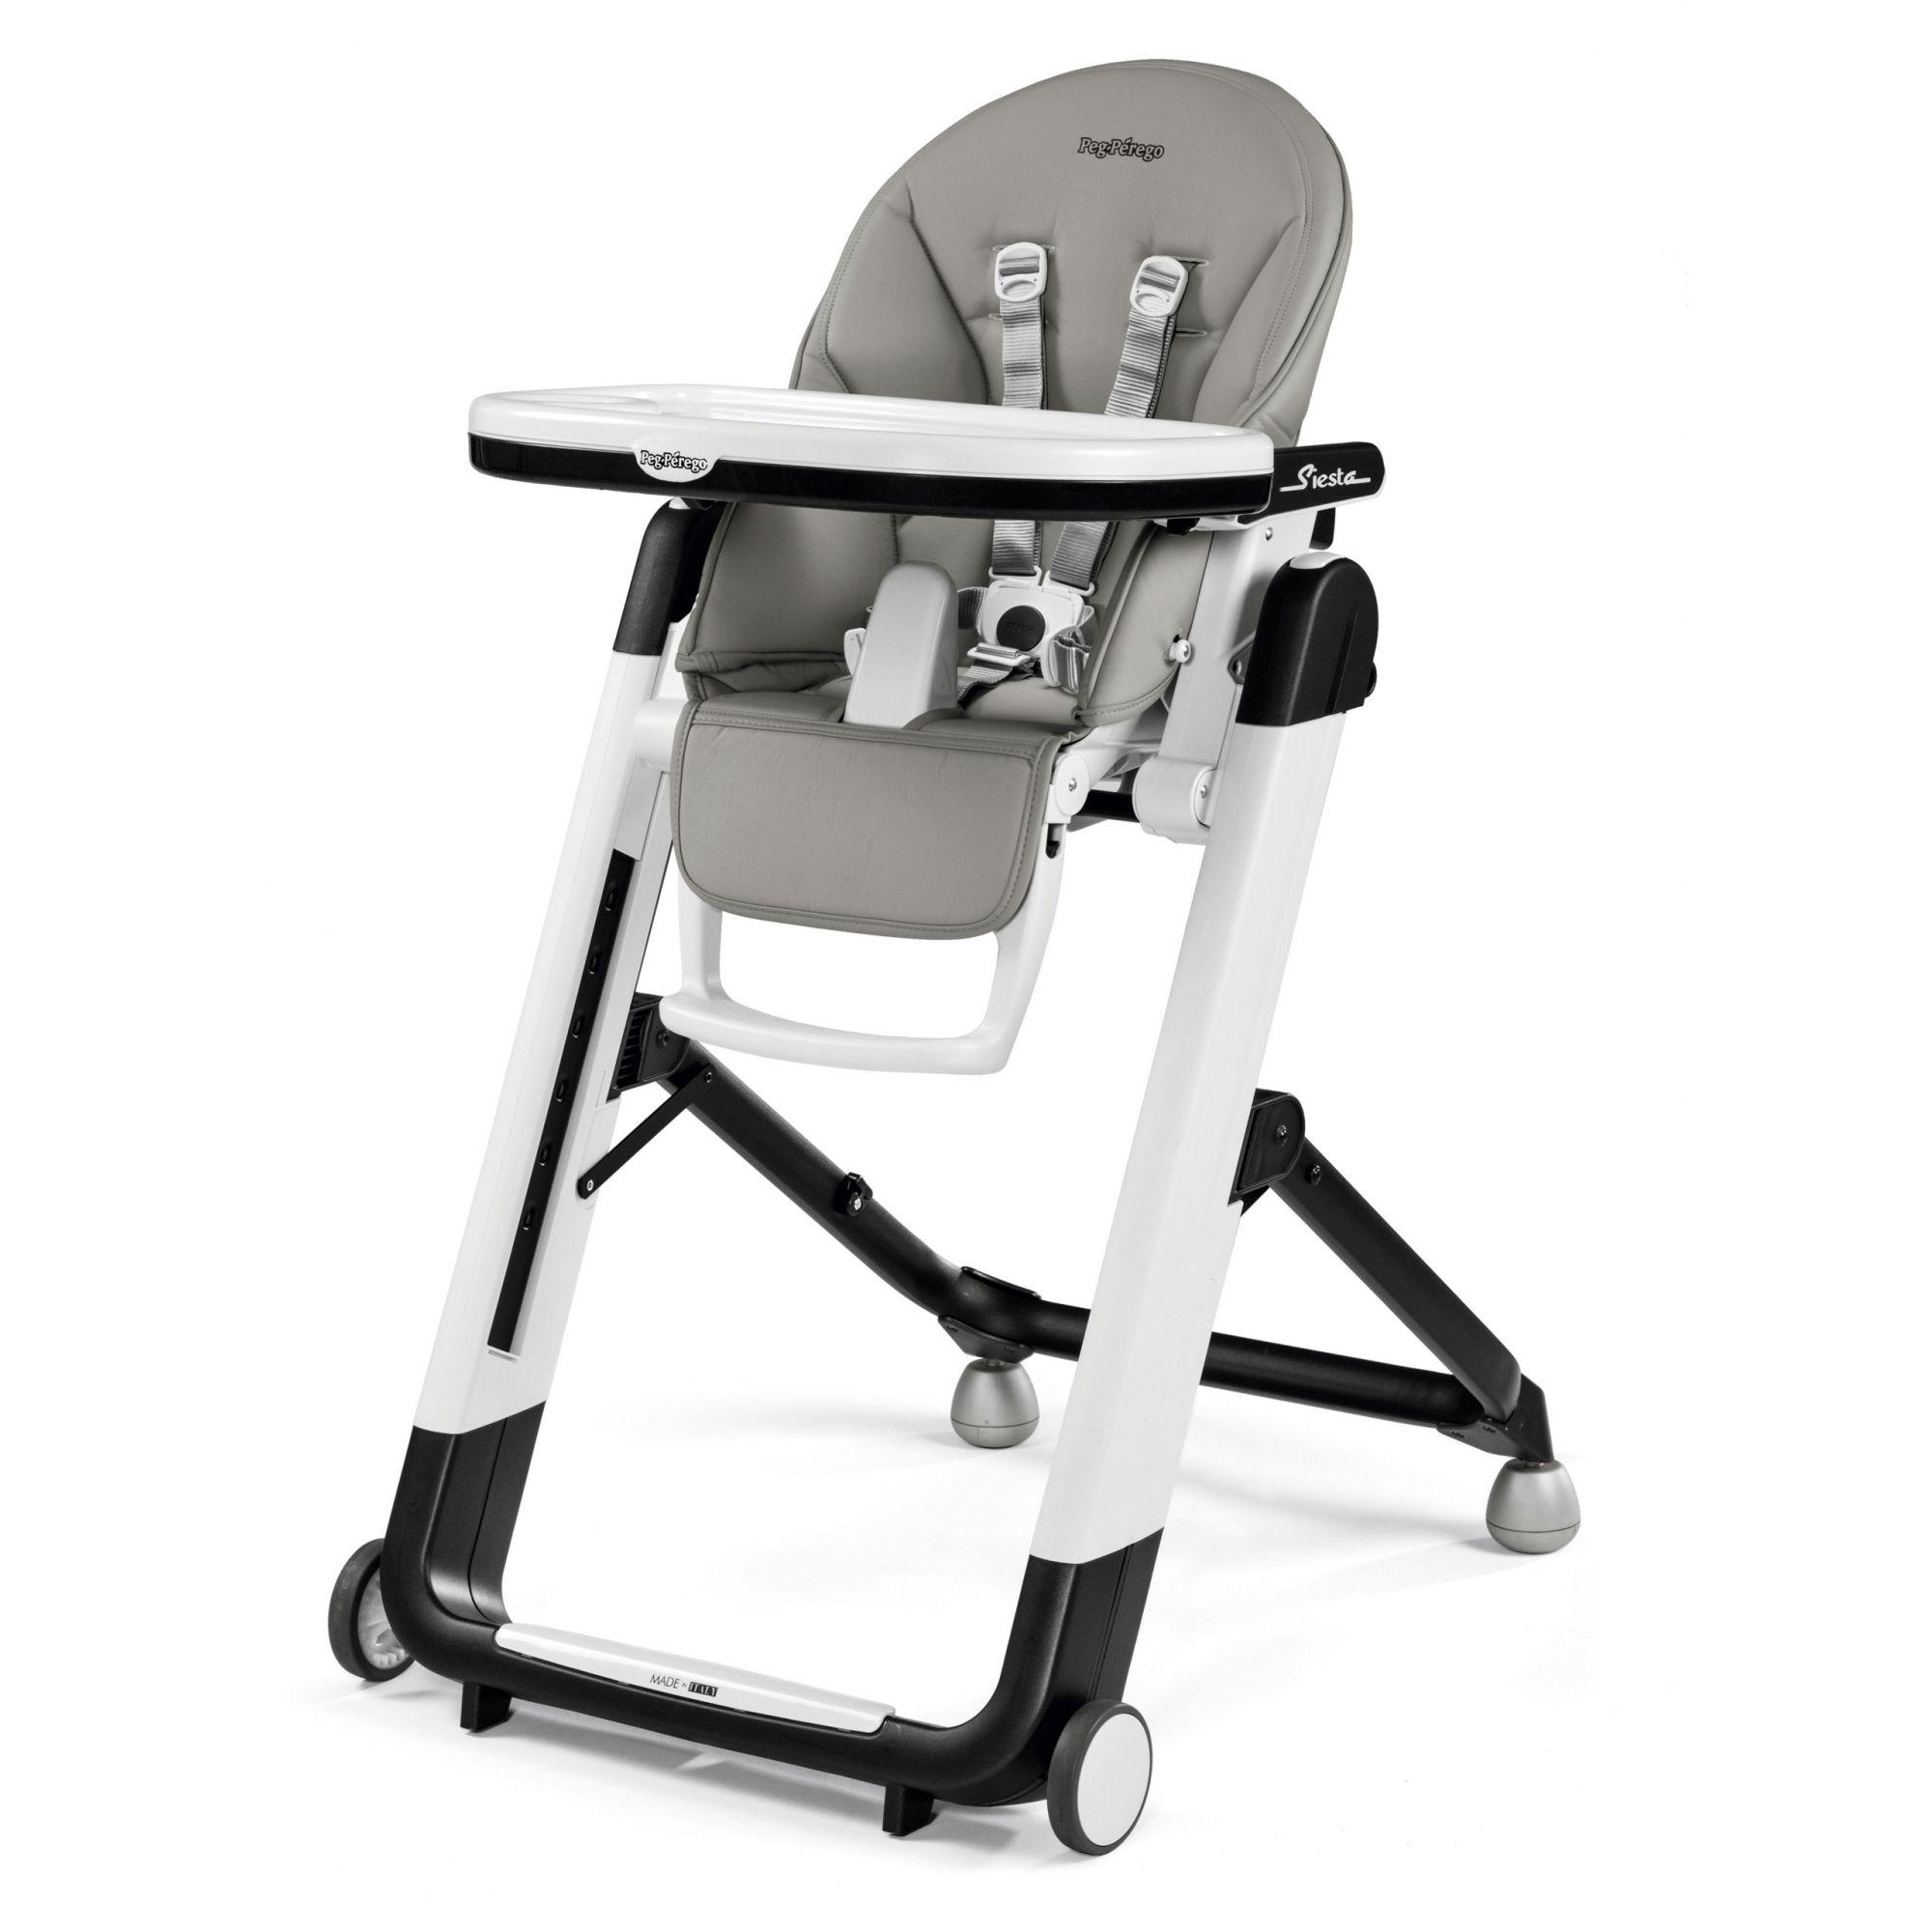 Cadeira Refeição Siesta Ice - Peg Perego  Ref Imsiesbr03bl73